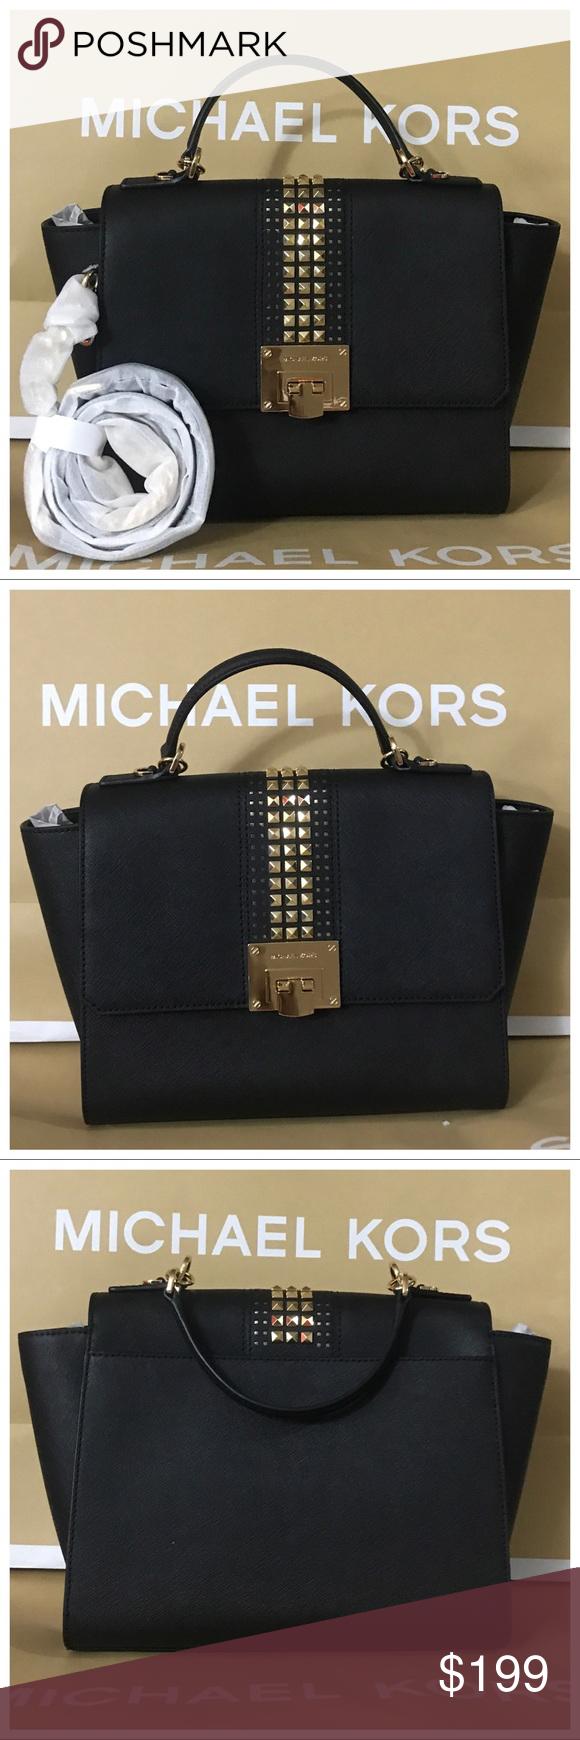 27fb3c37cee7af Nwt mk tina medium studded leather satchel-black MICHAEL Michael Kors  Michael Kors Tina Medium